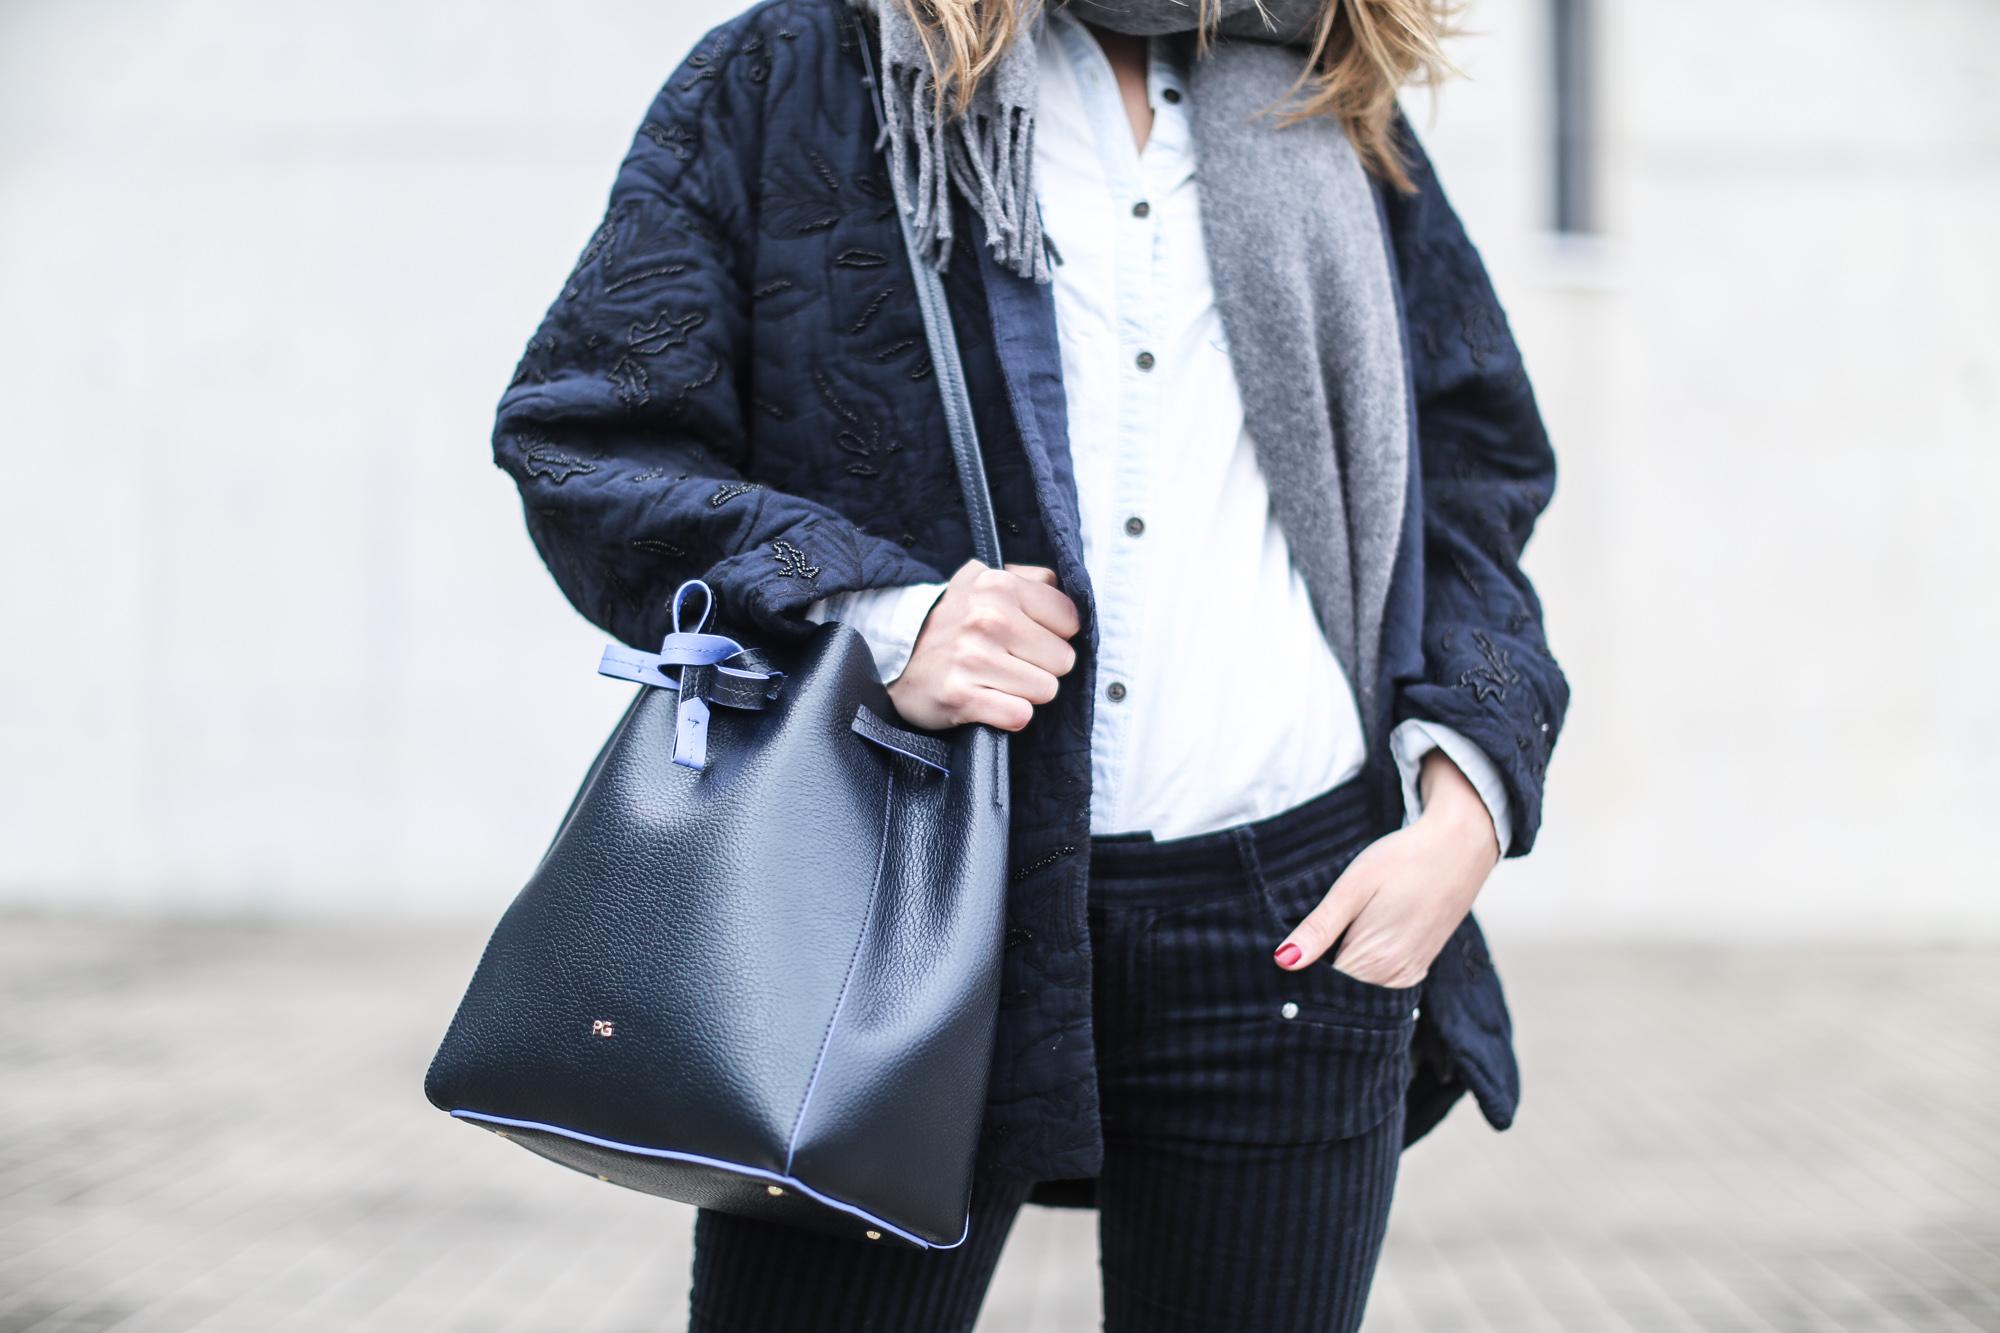 clochet_streetstyle_embroided_kimono_jacket_purificacion_garcia_bucket_bag-9